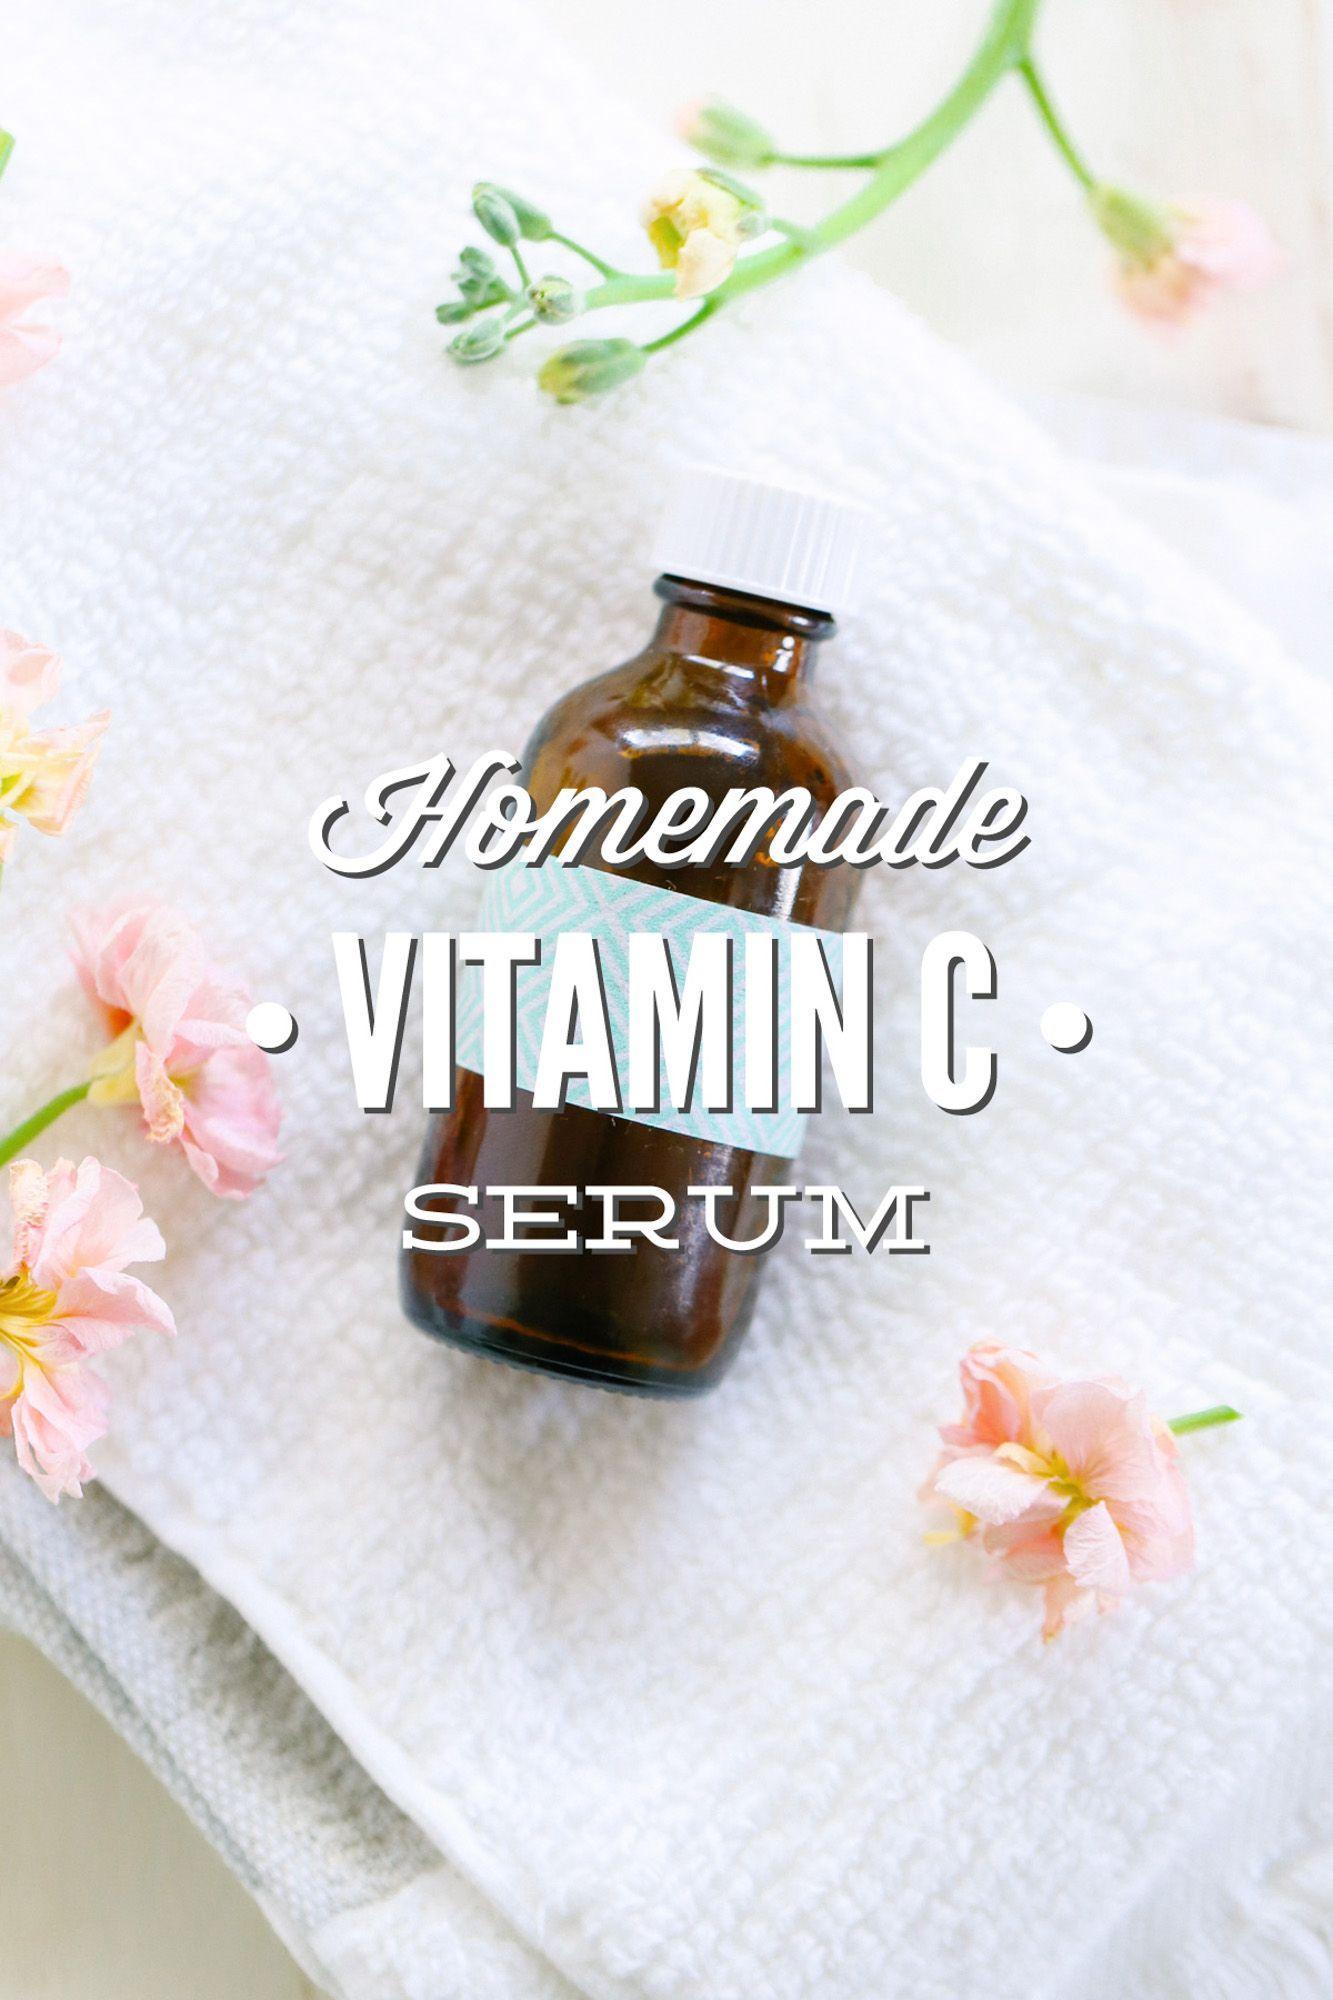 Homemade vitamin c serum diy vitamin c serum vitamin c